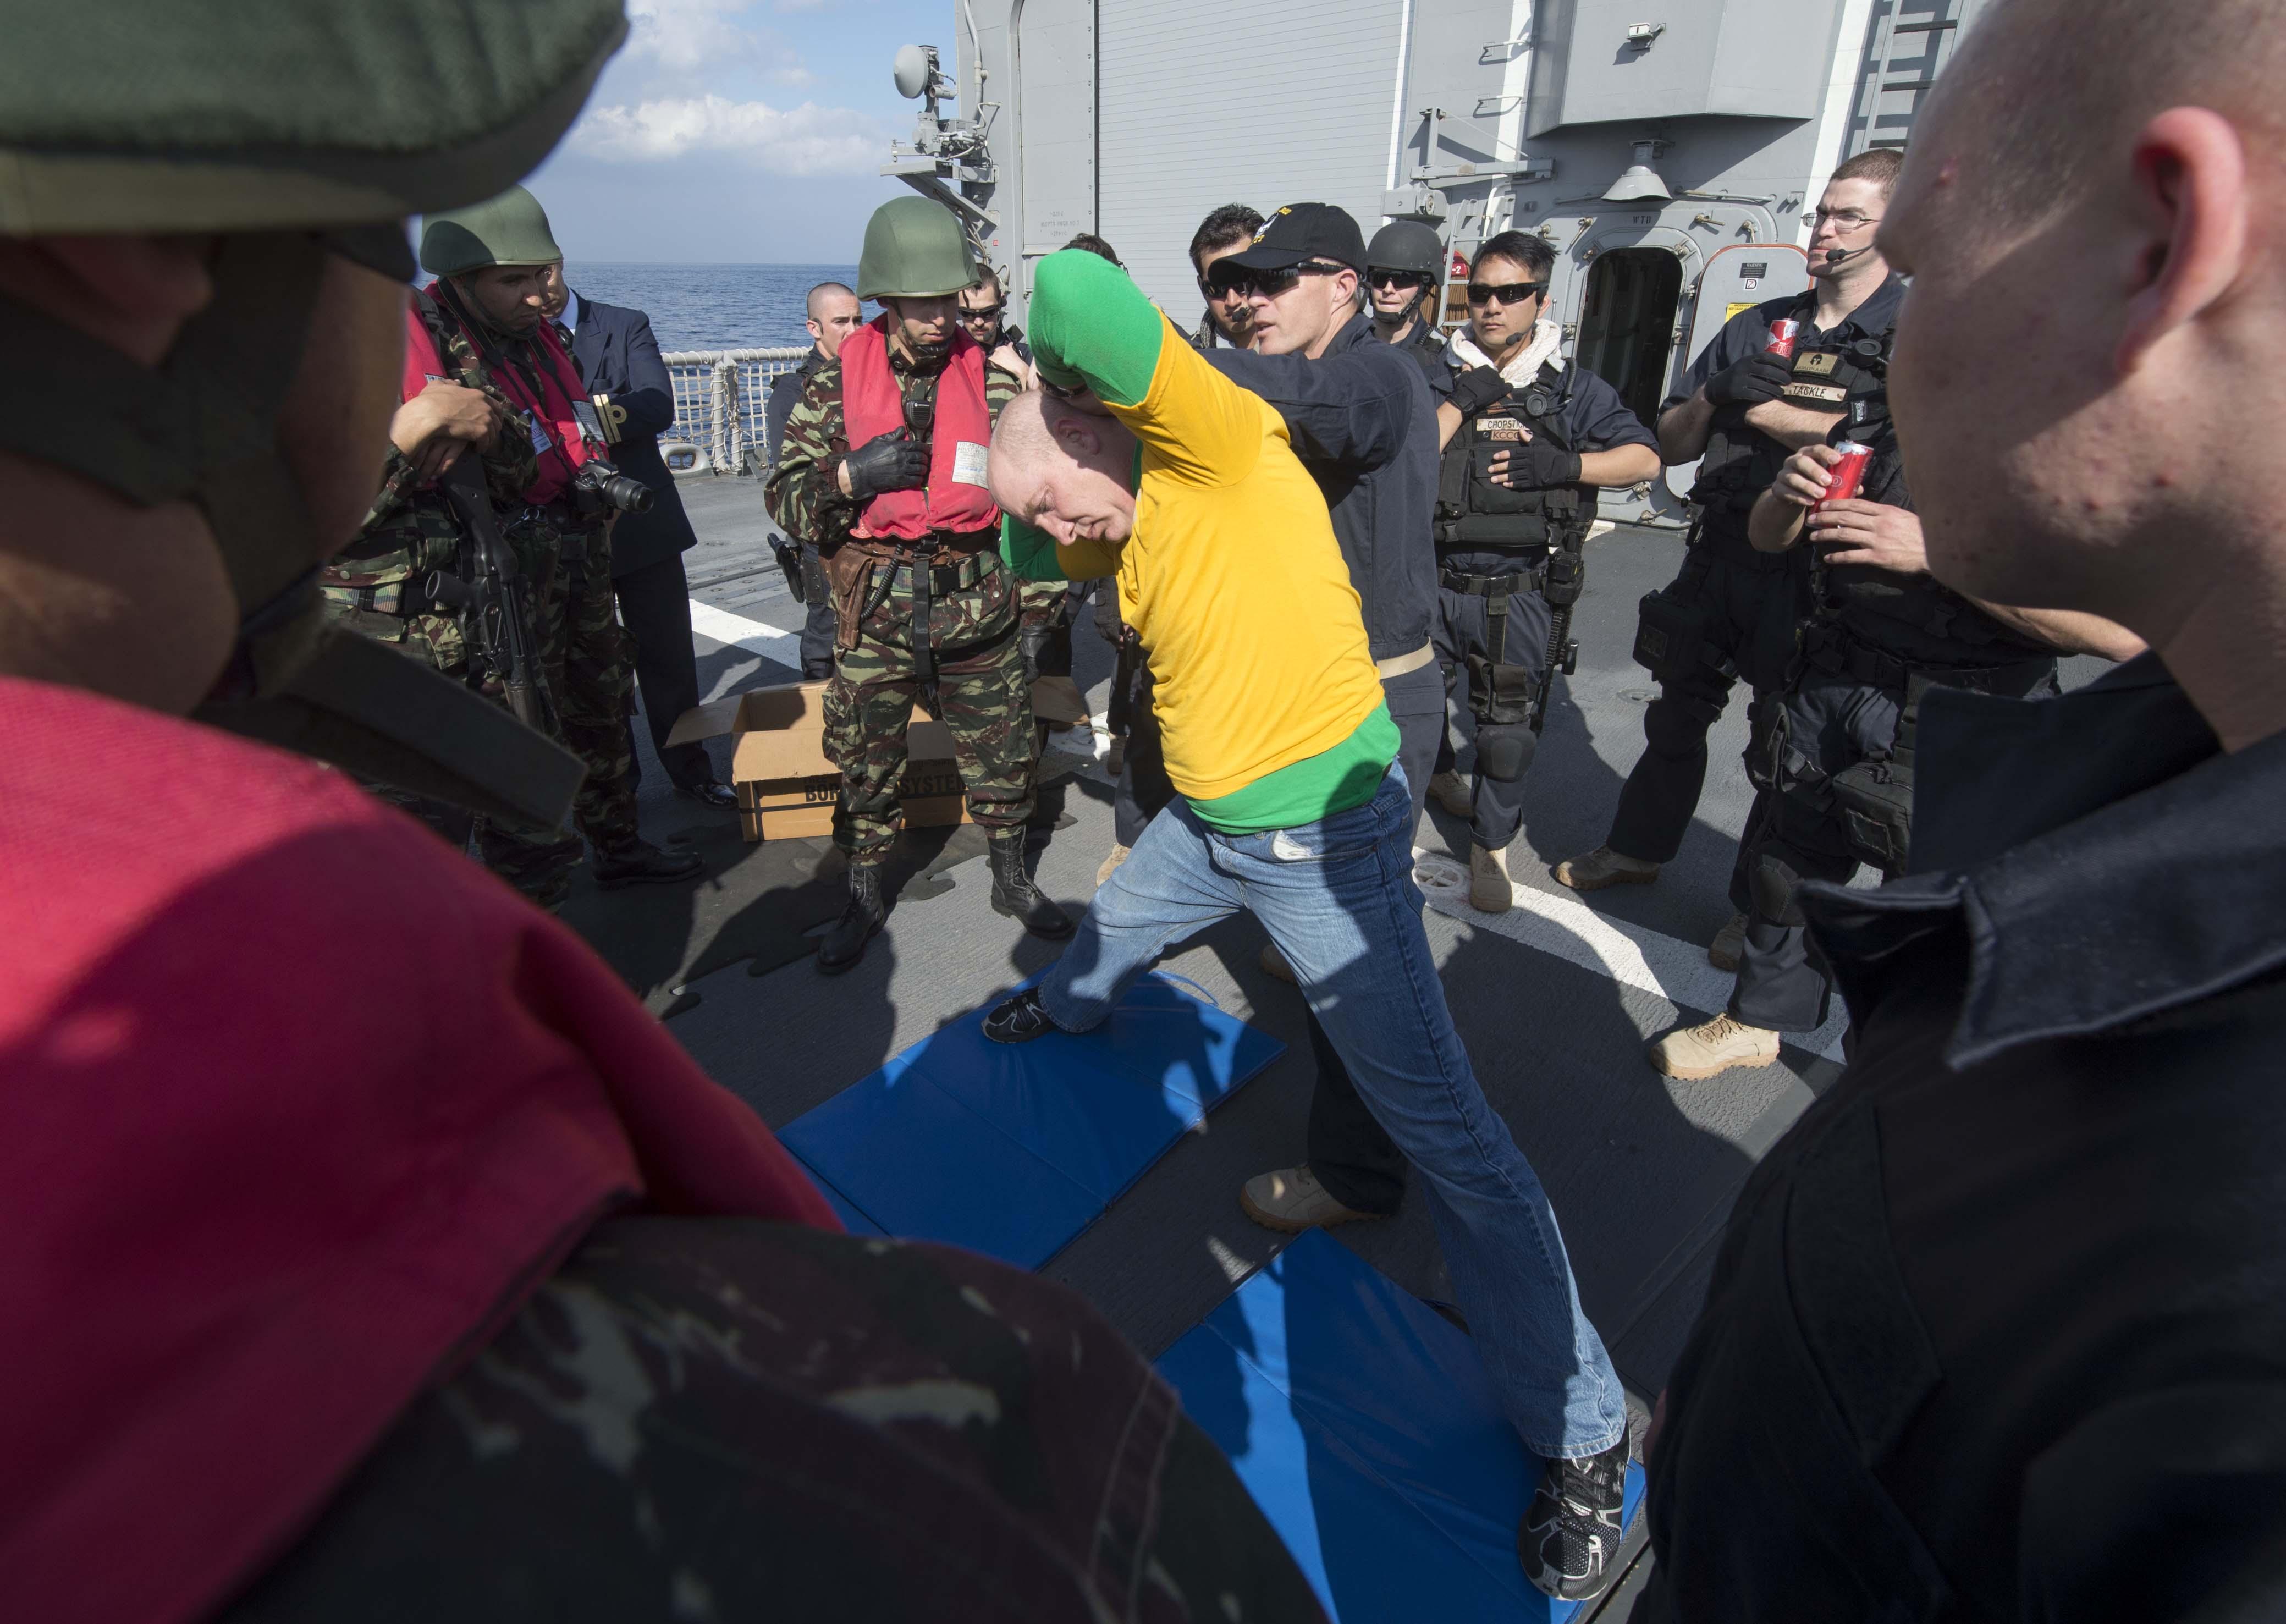 PASSEX 2014-1 ( USS Elrod (FFG55) et RMN Allal Ben Abdellah (615) ) 12363879273_a9ac44c116_o